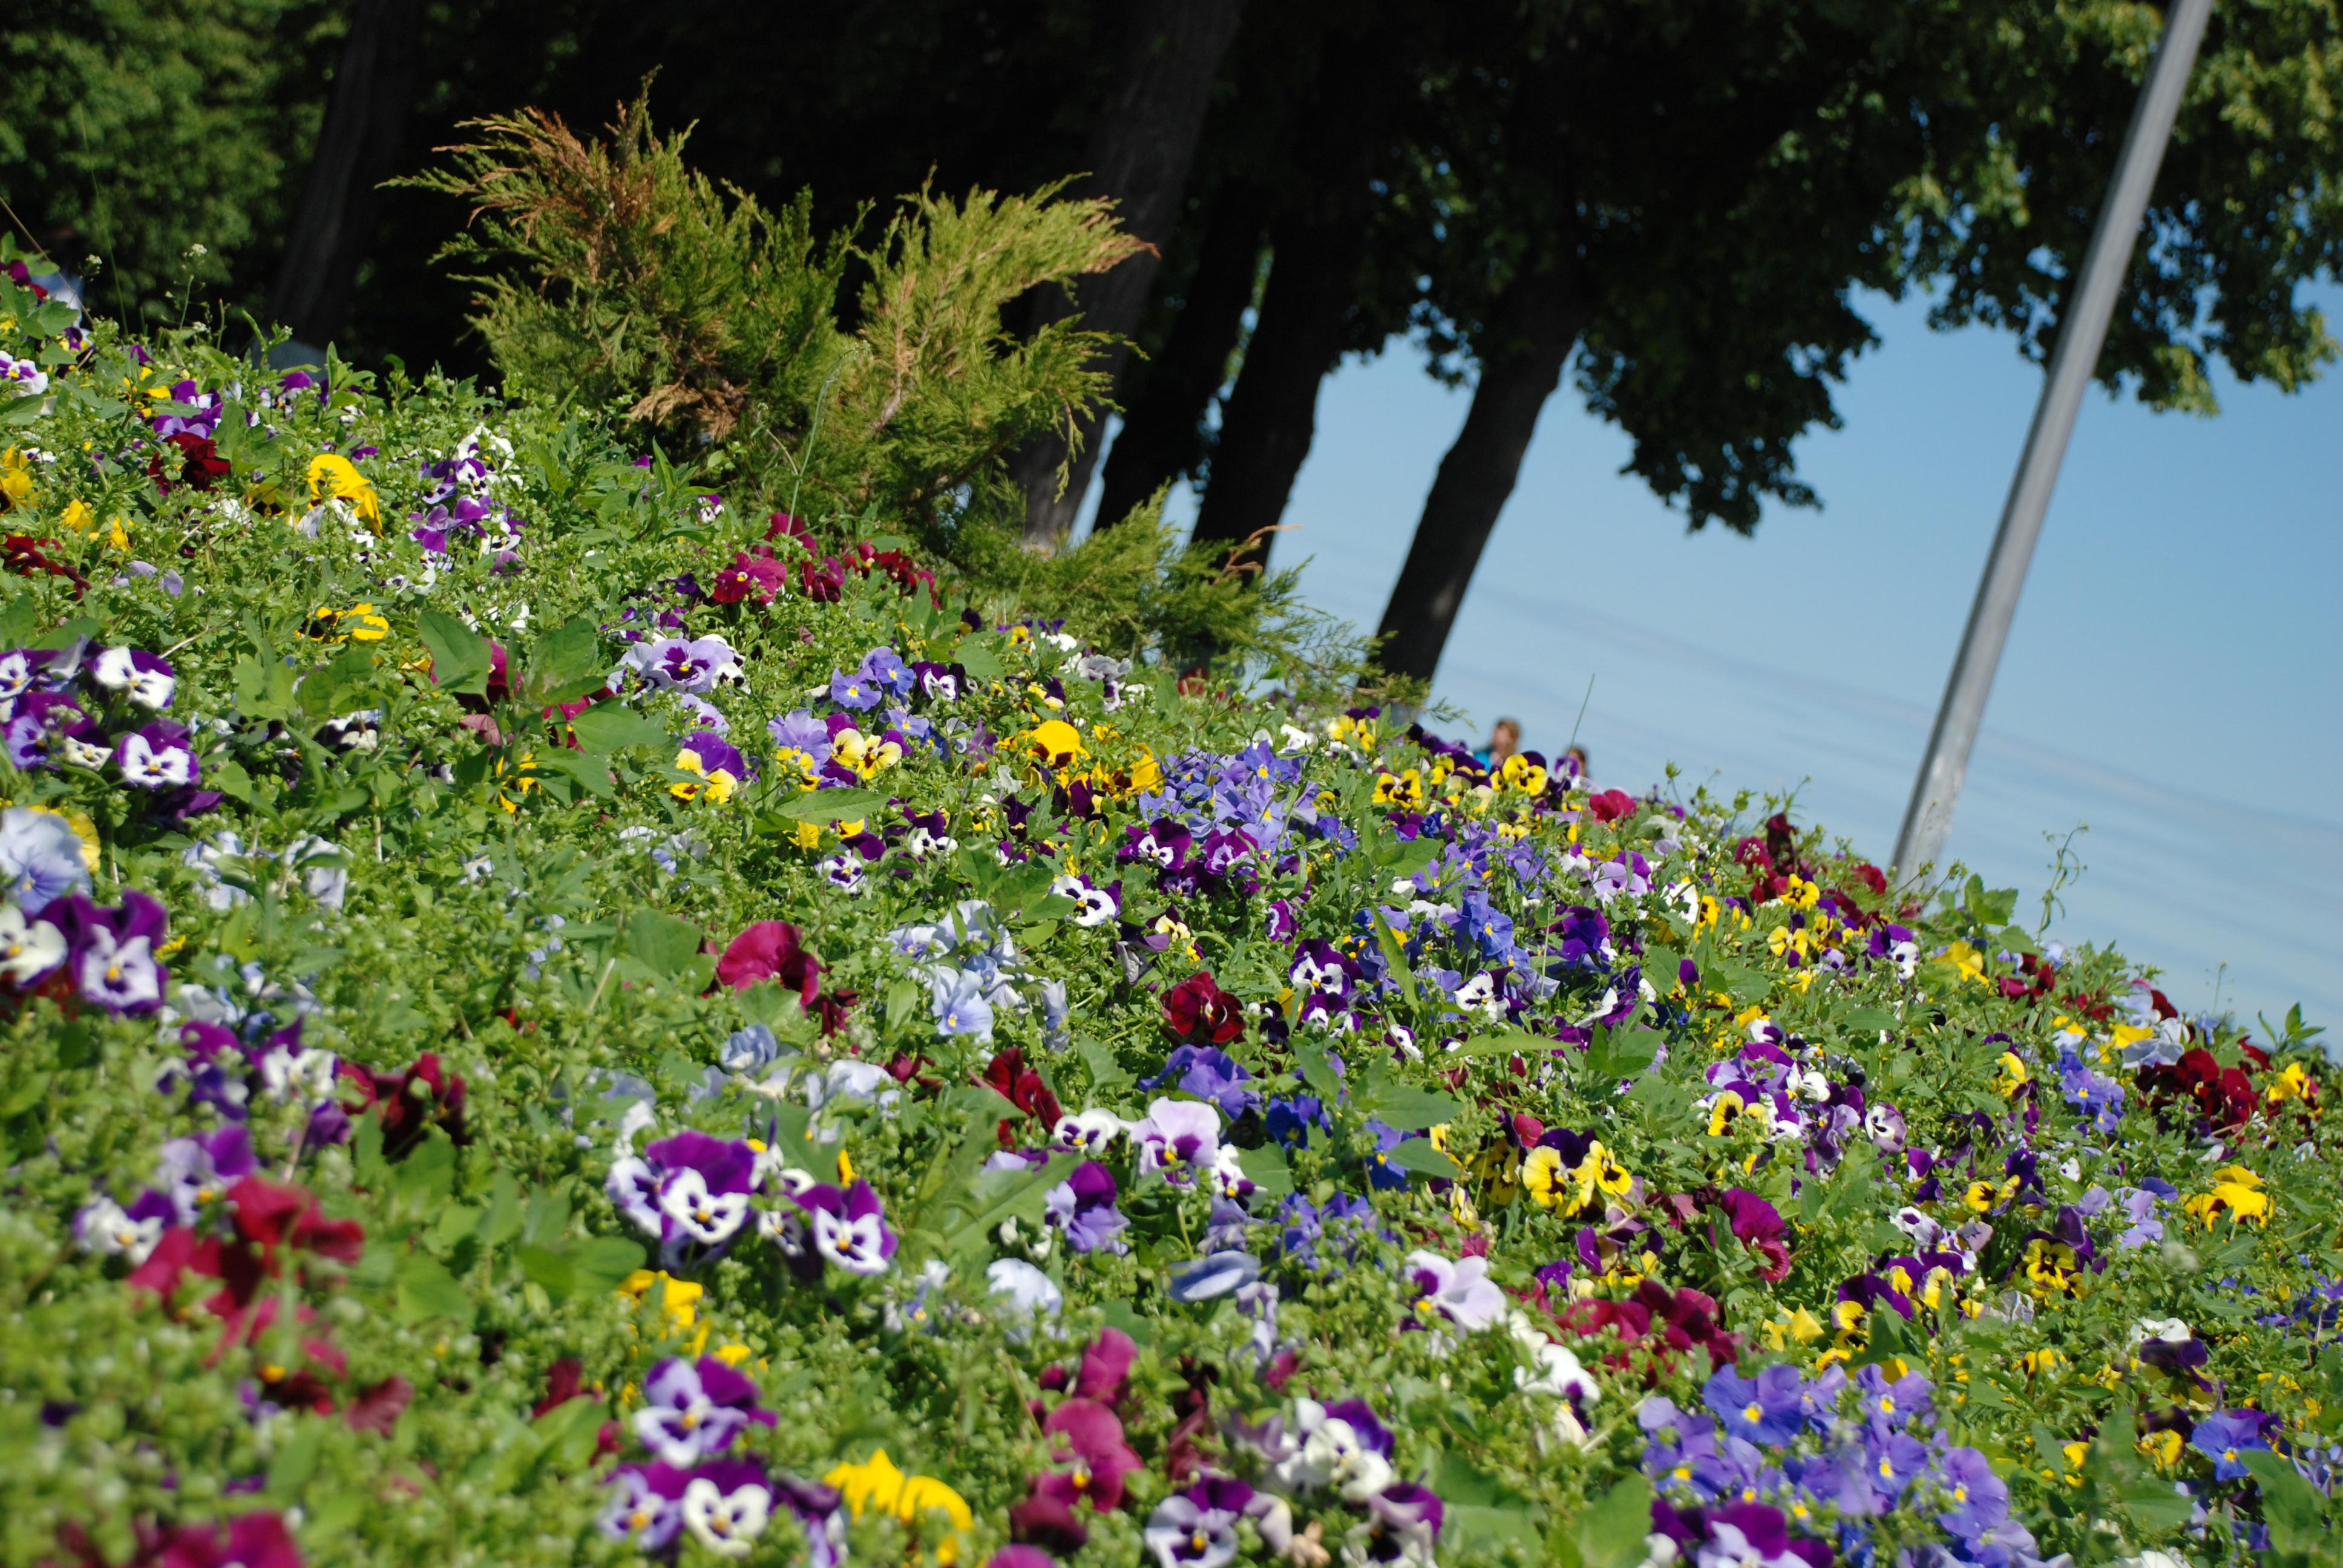 Картинка лужайка цветов